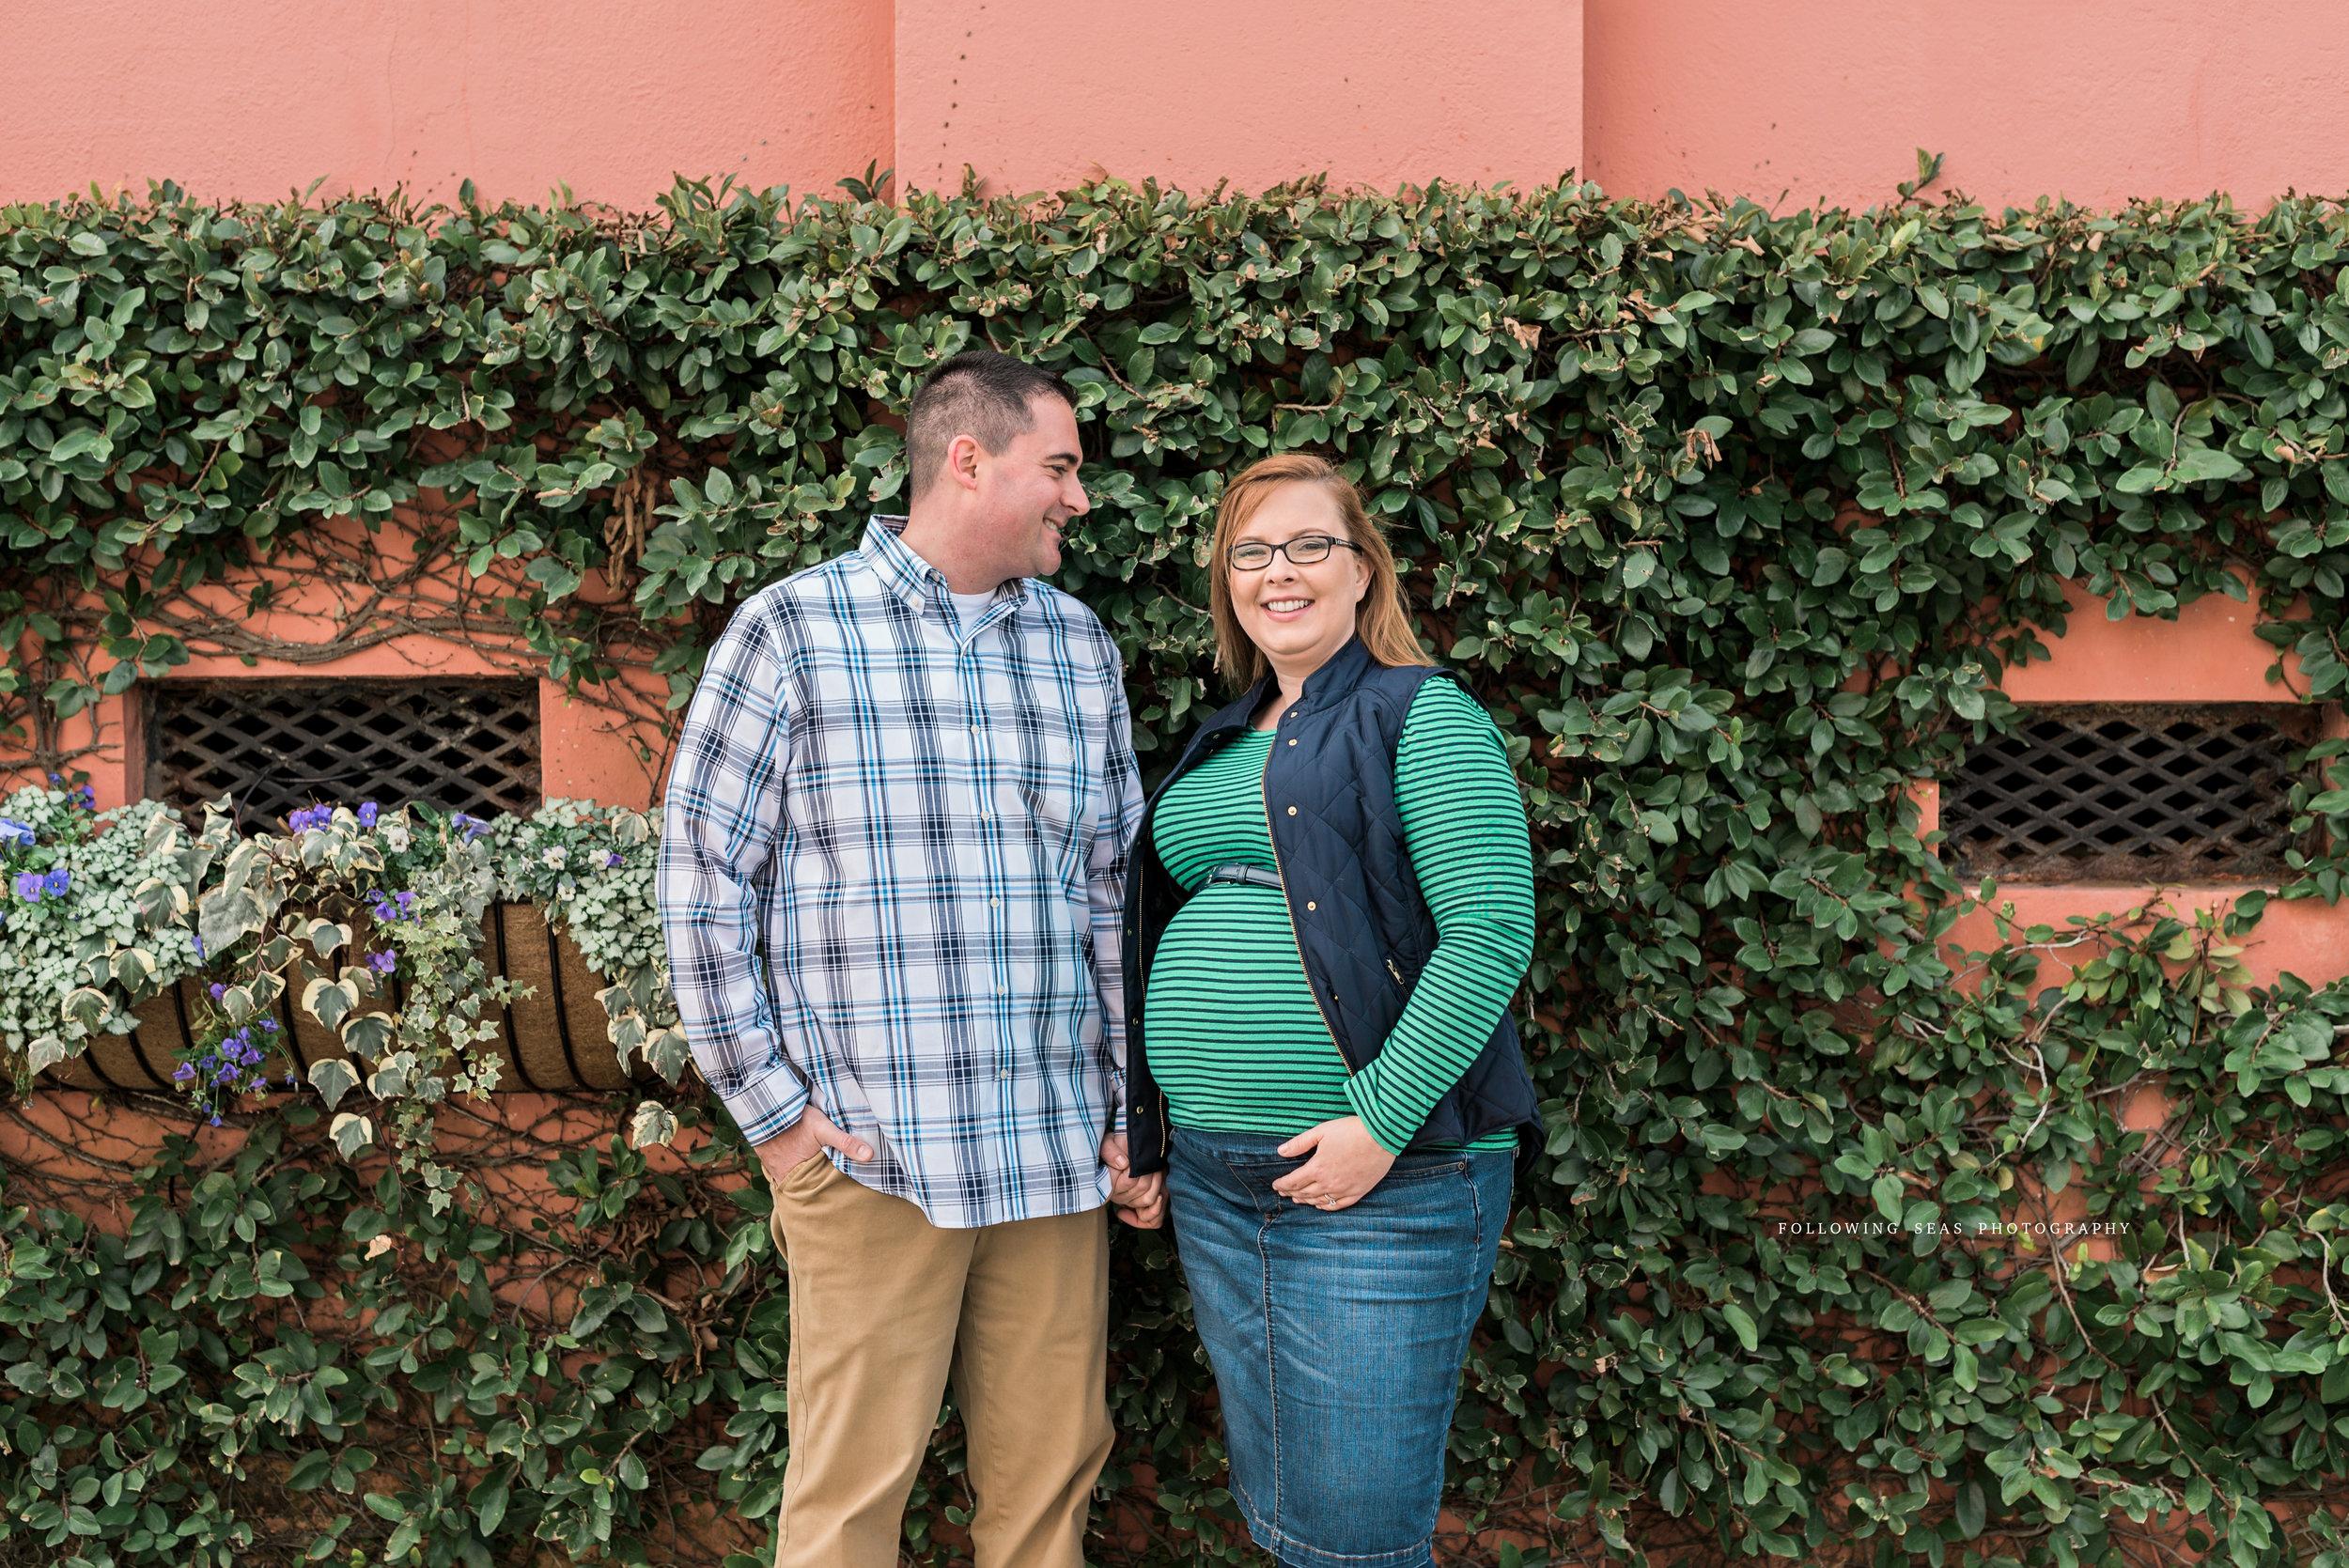 Charleston-Maternity-Photographer-Following-Seas-Photography-7856.jpg